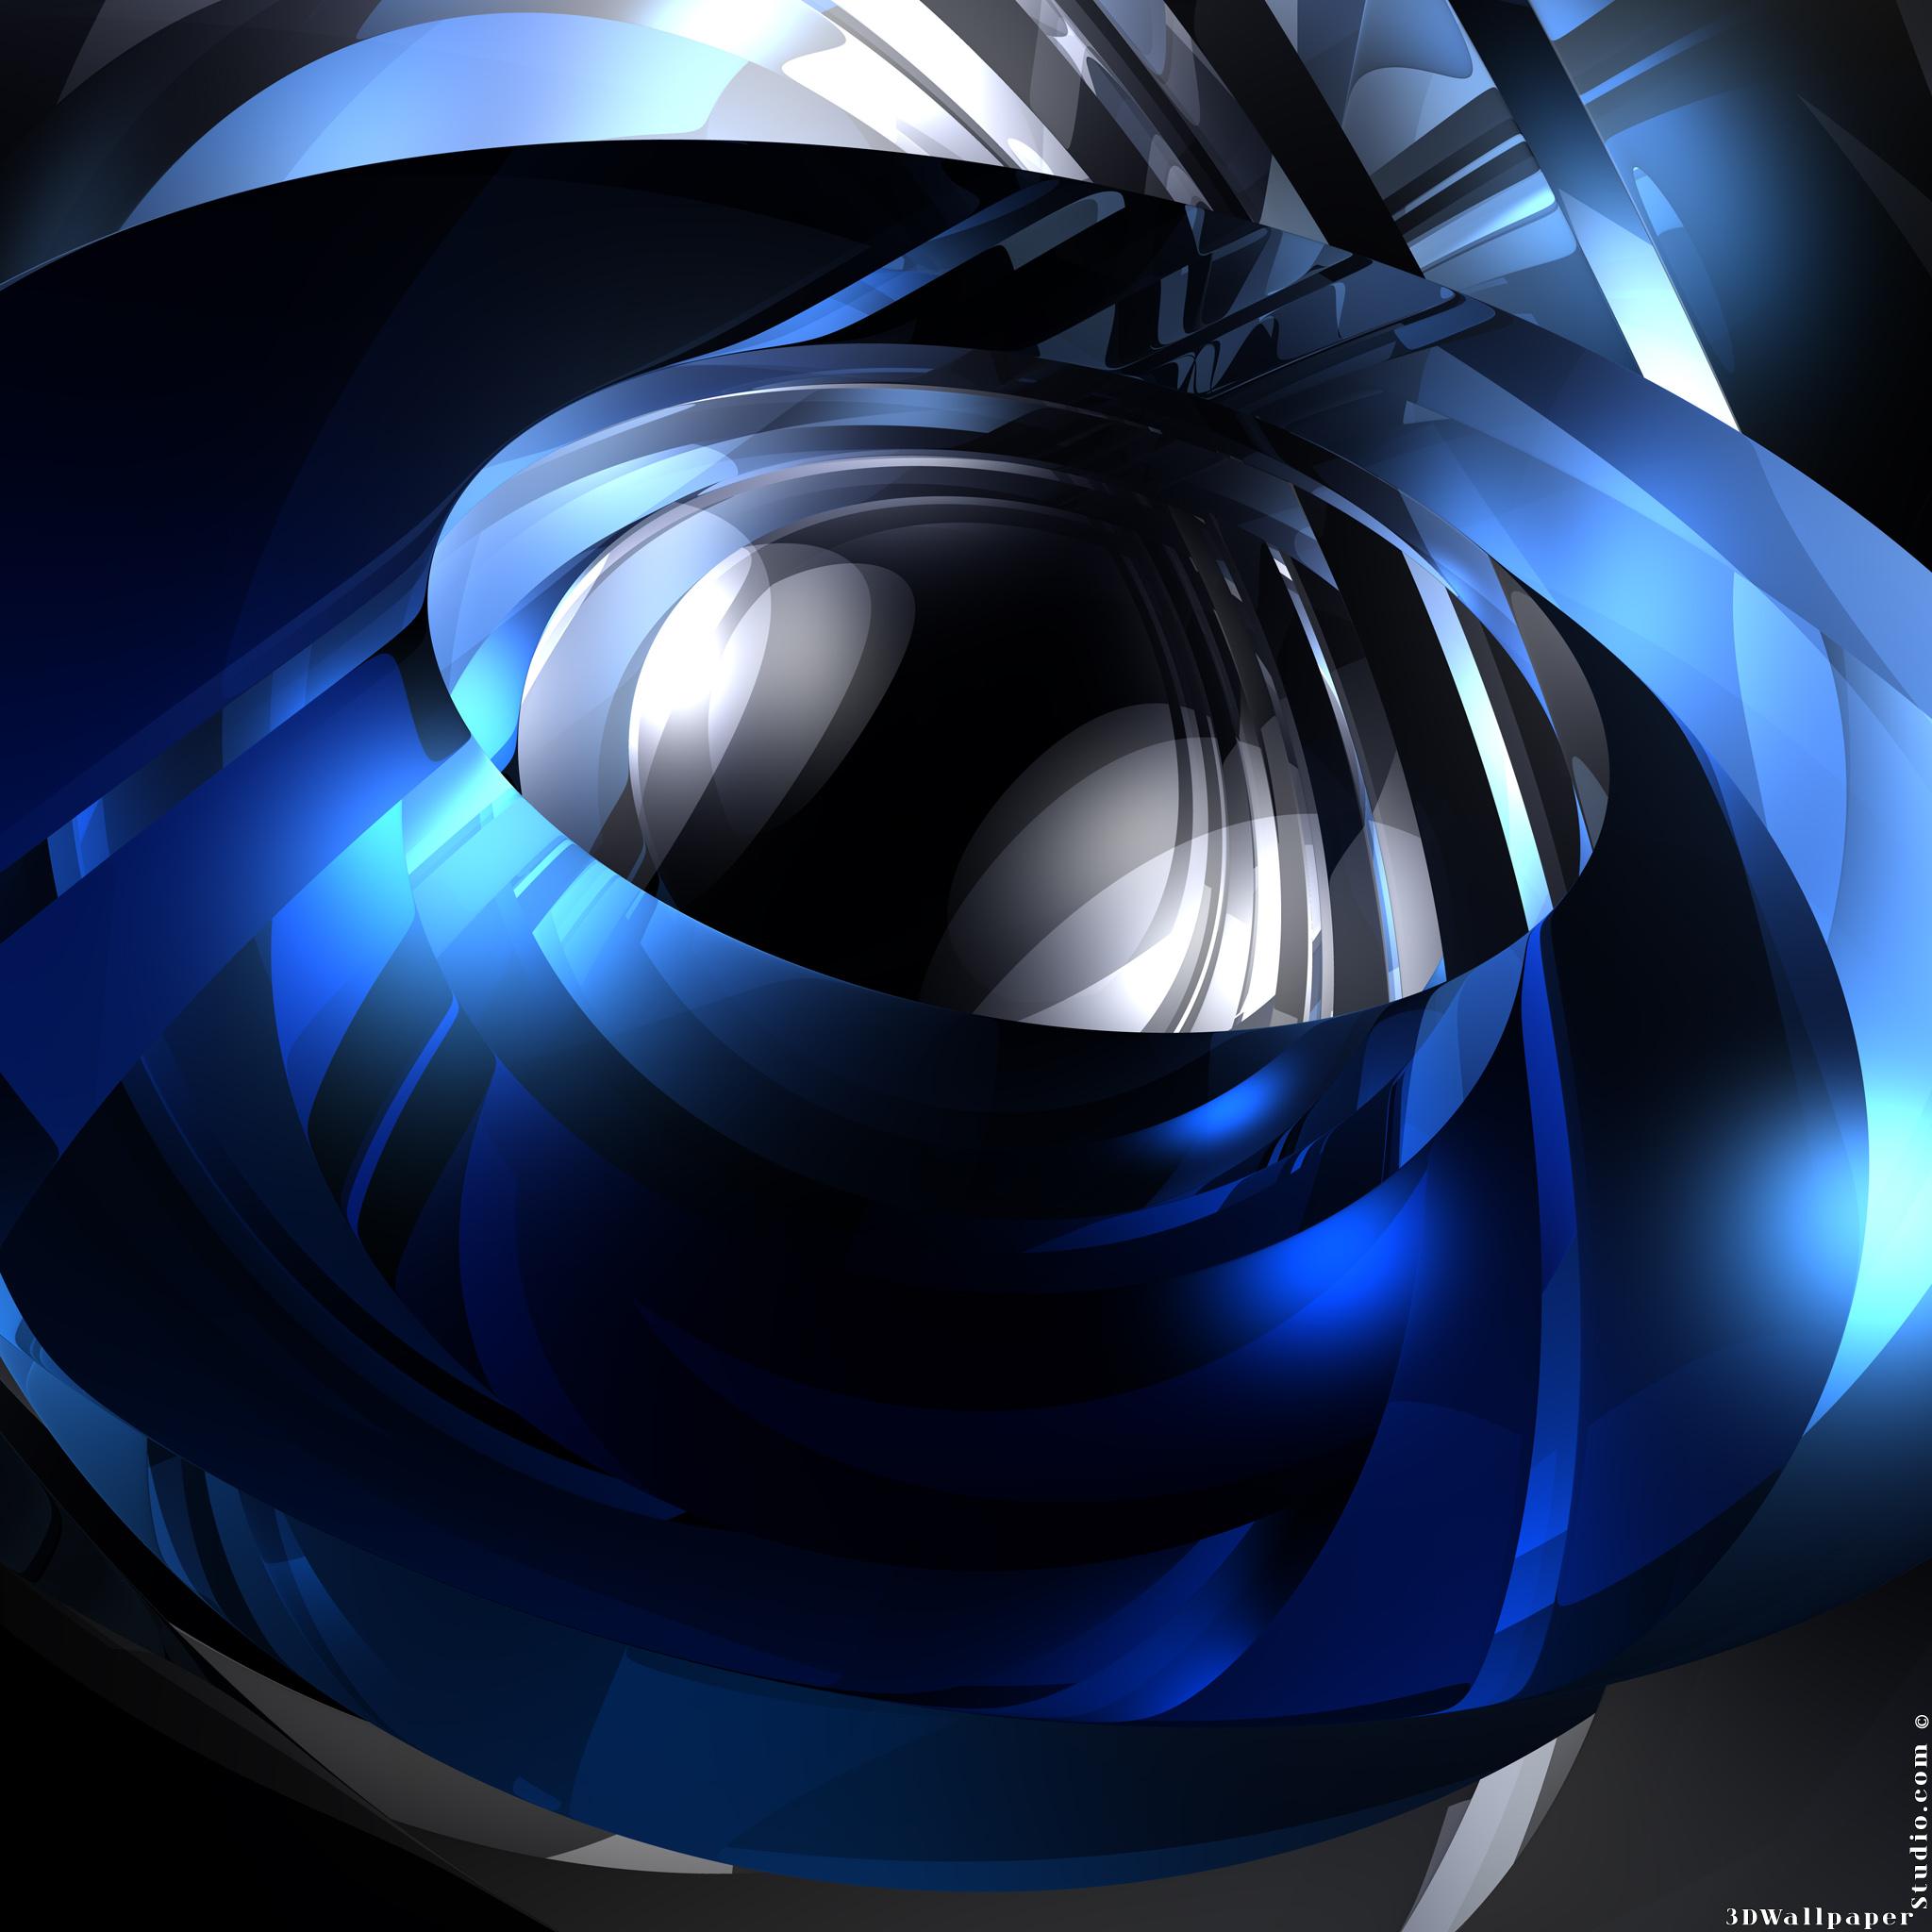 3D Wallpaper Delightfully blue 2048 x 2048 2048x2048